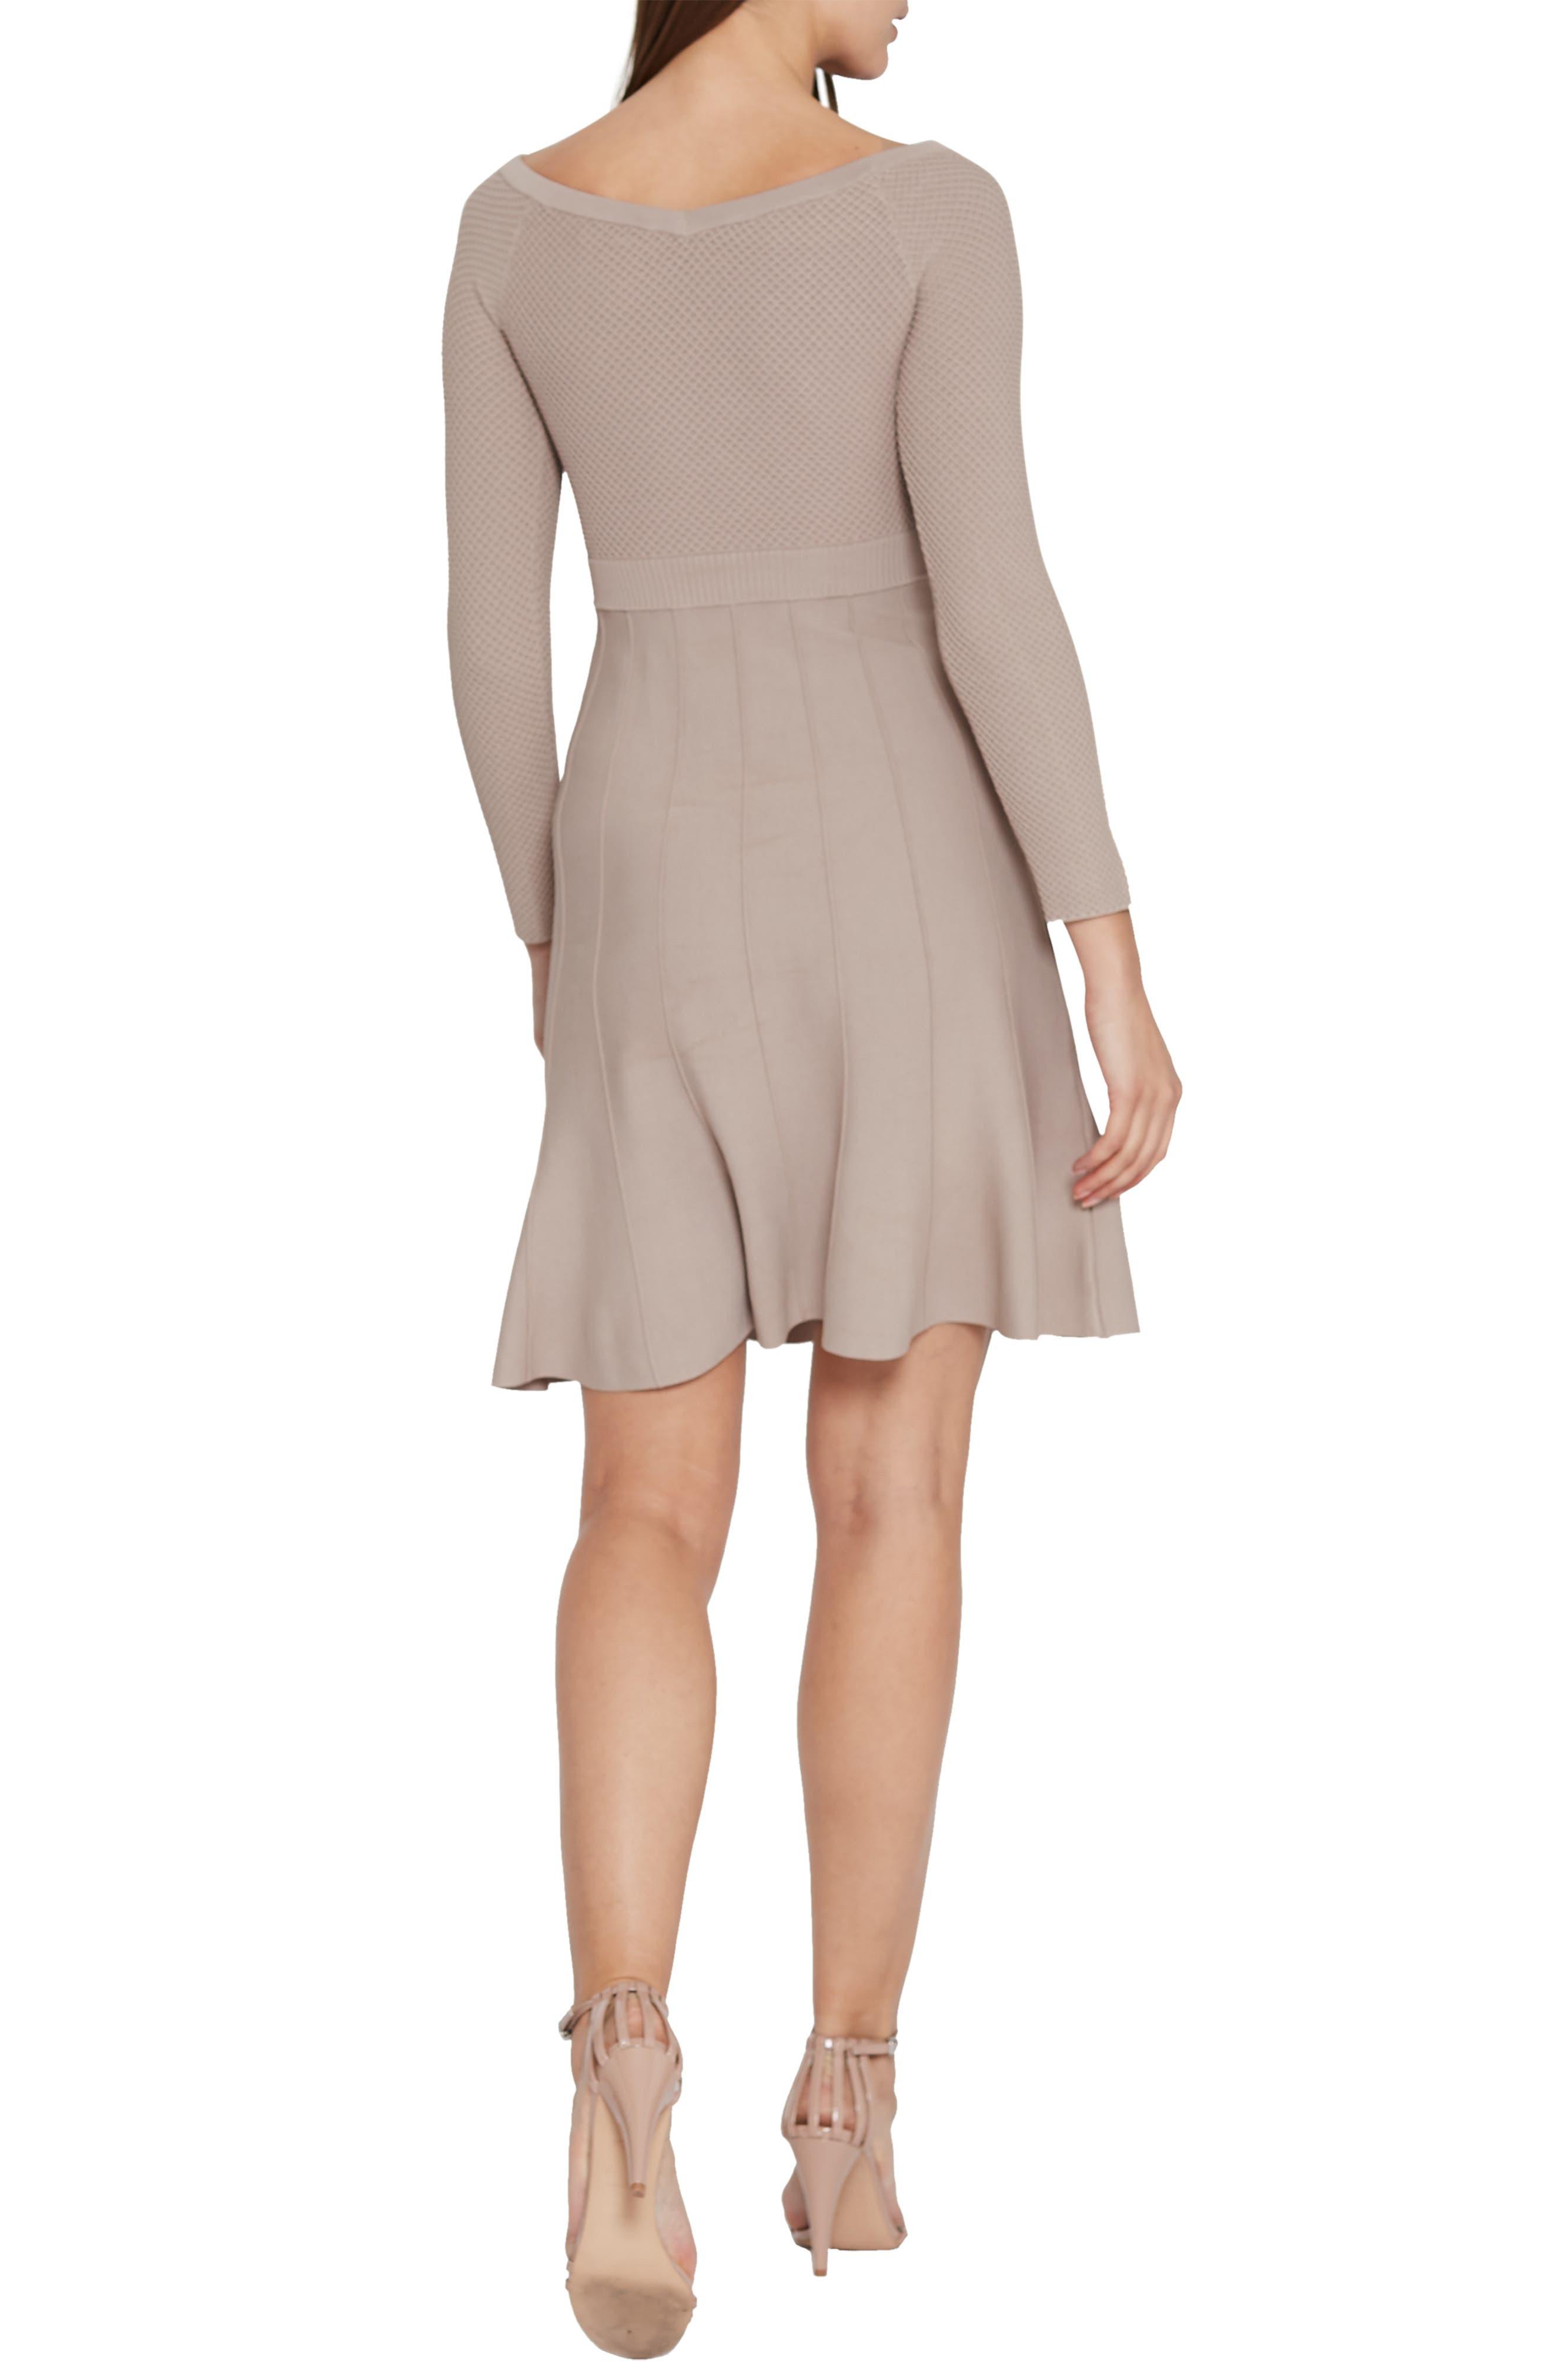 Astra Textured Skater Dress,                             Alternate thumbnail 2, color,                             NEUTRAL